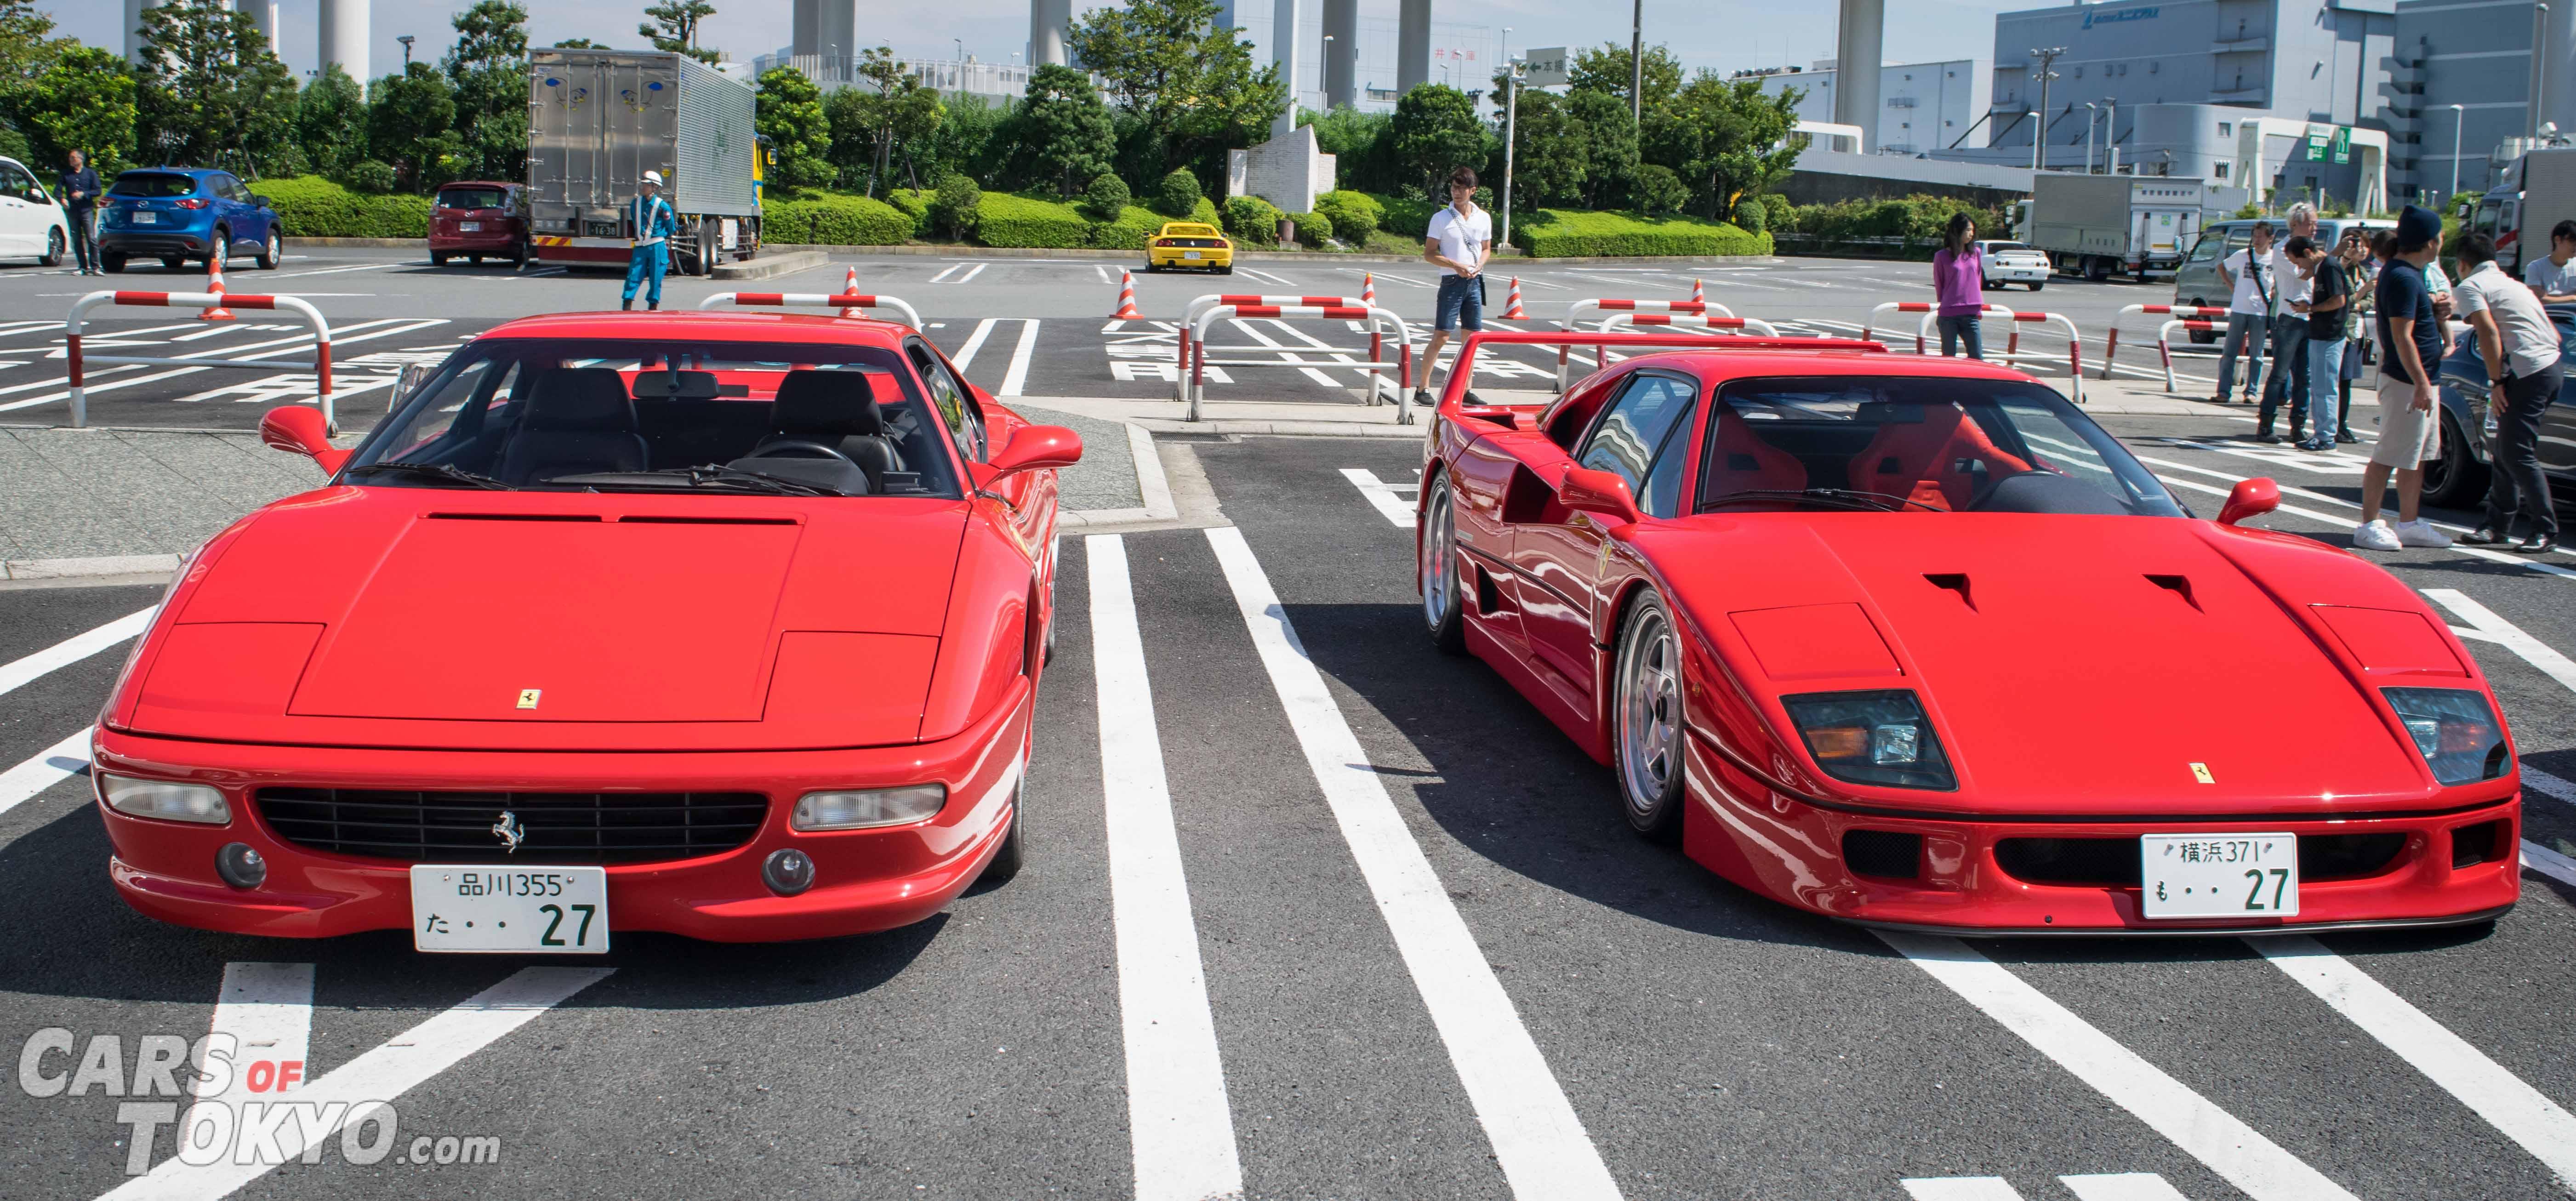 Cars of Tokyo Classic Ferrari 355 & F40